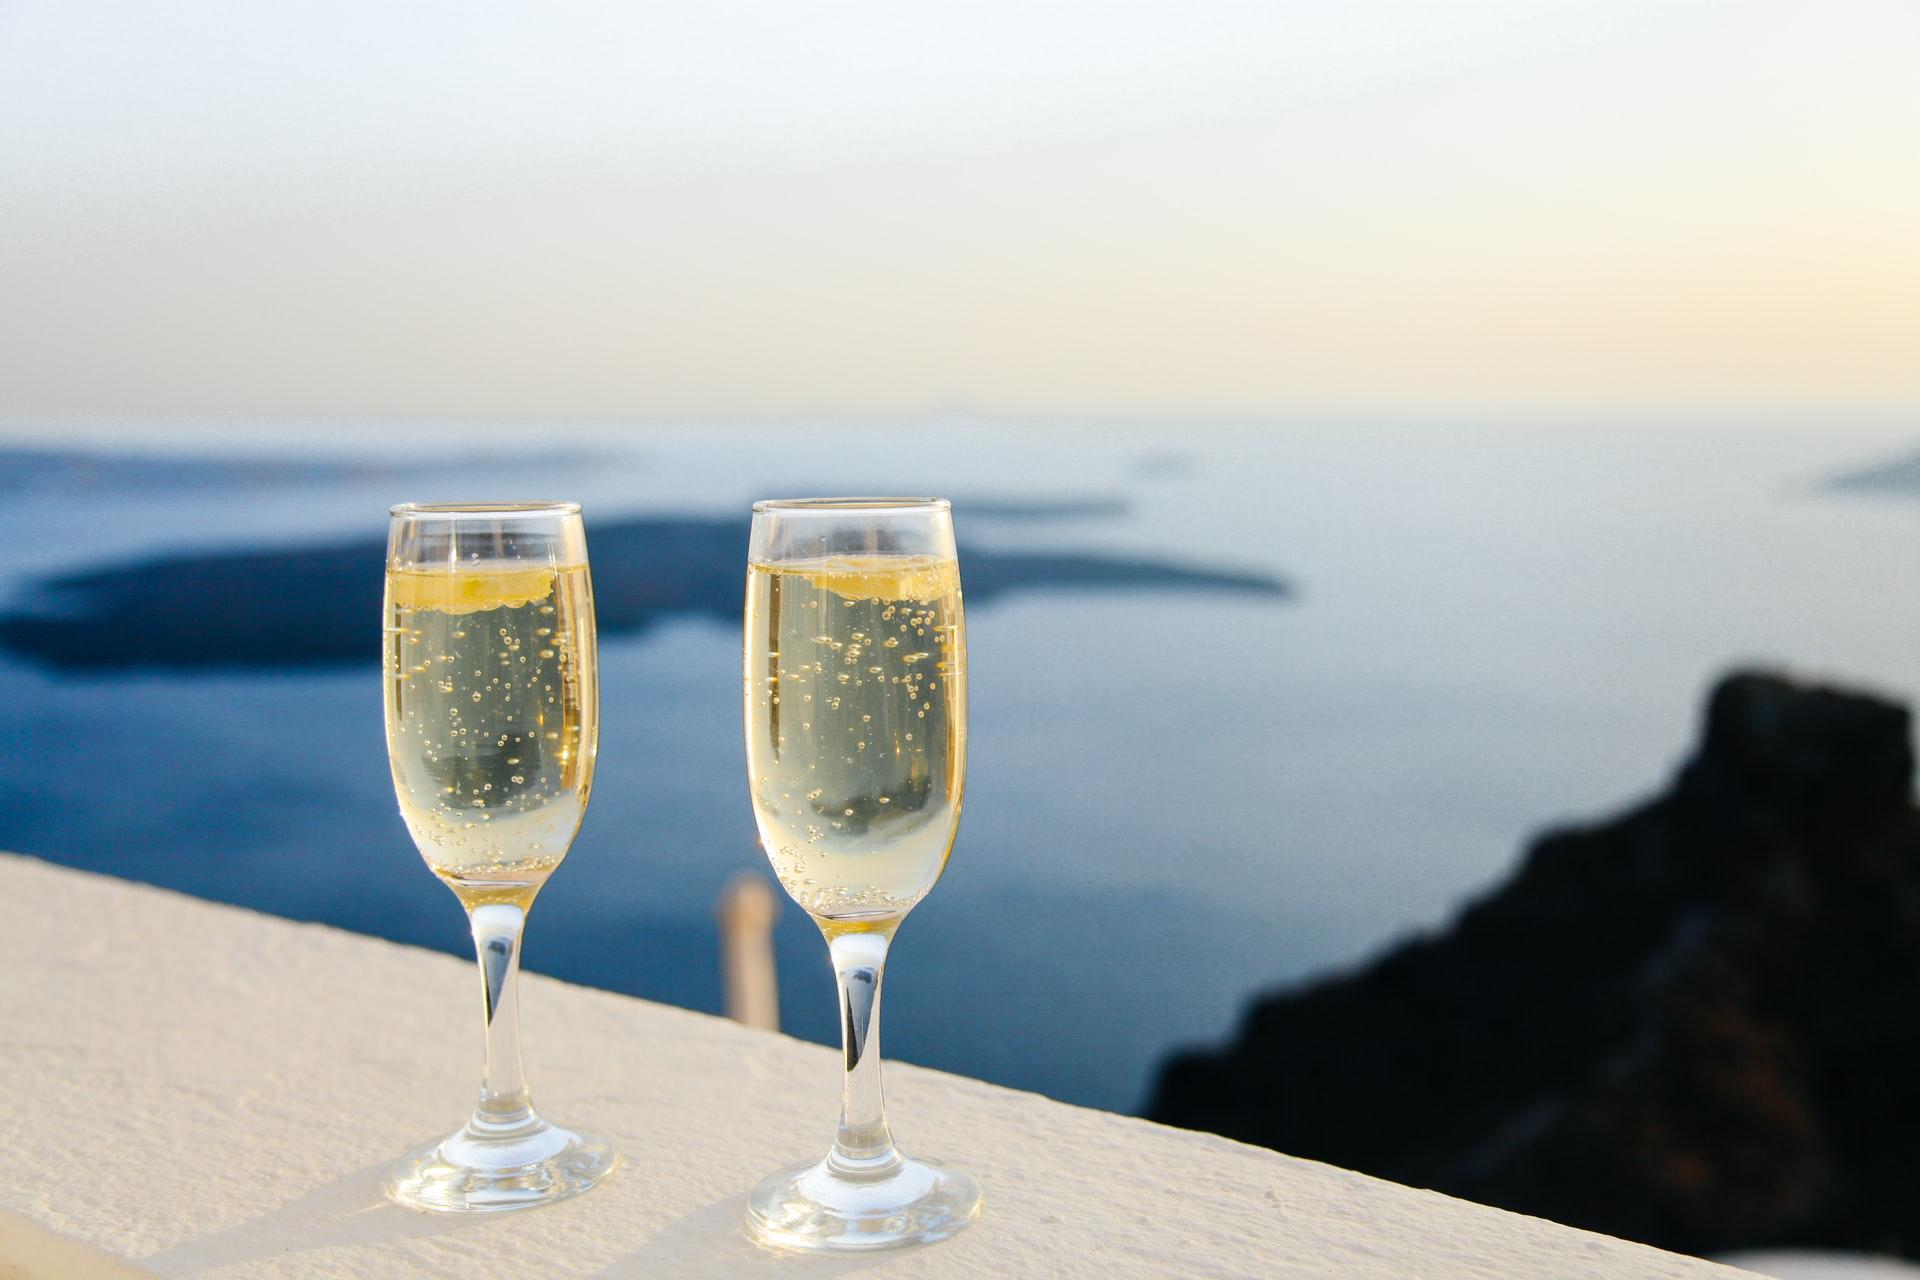 Enkele goede redenen om champagne te drinken